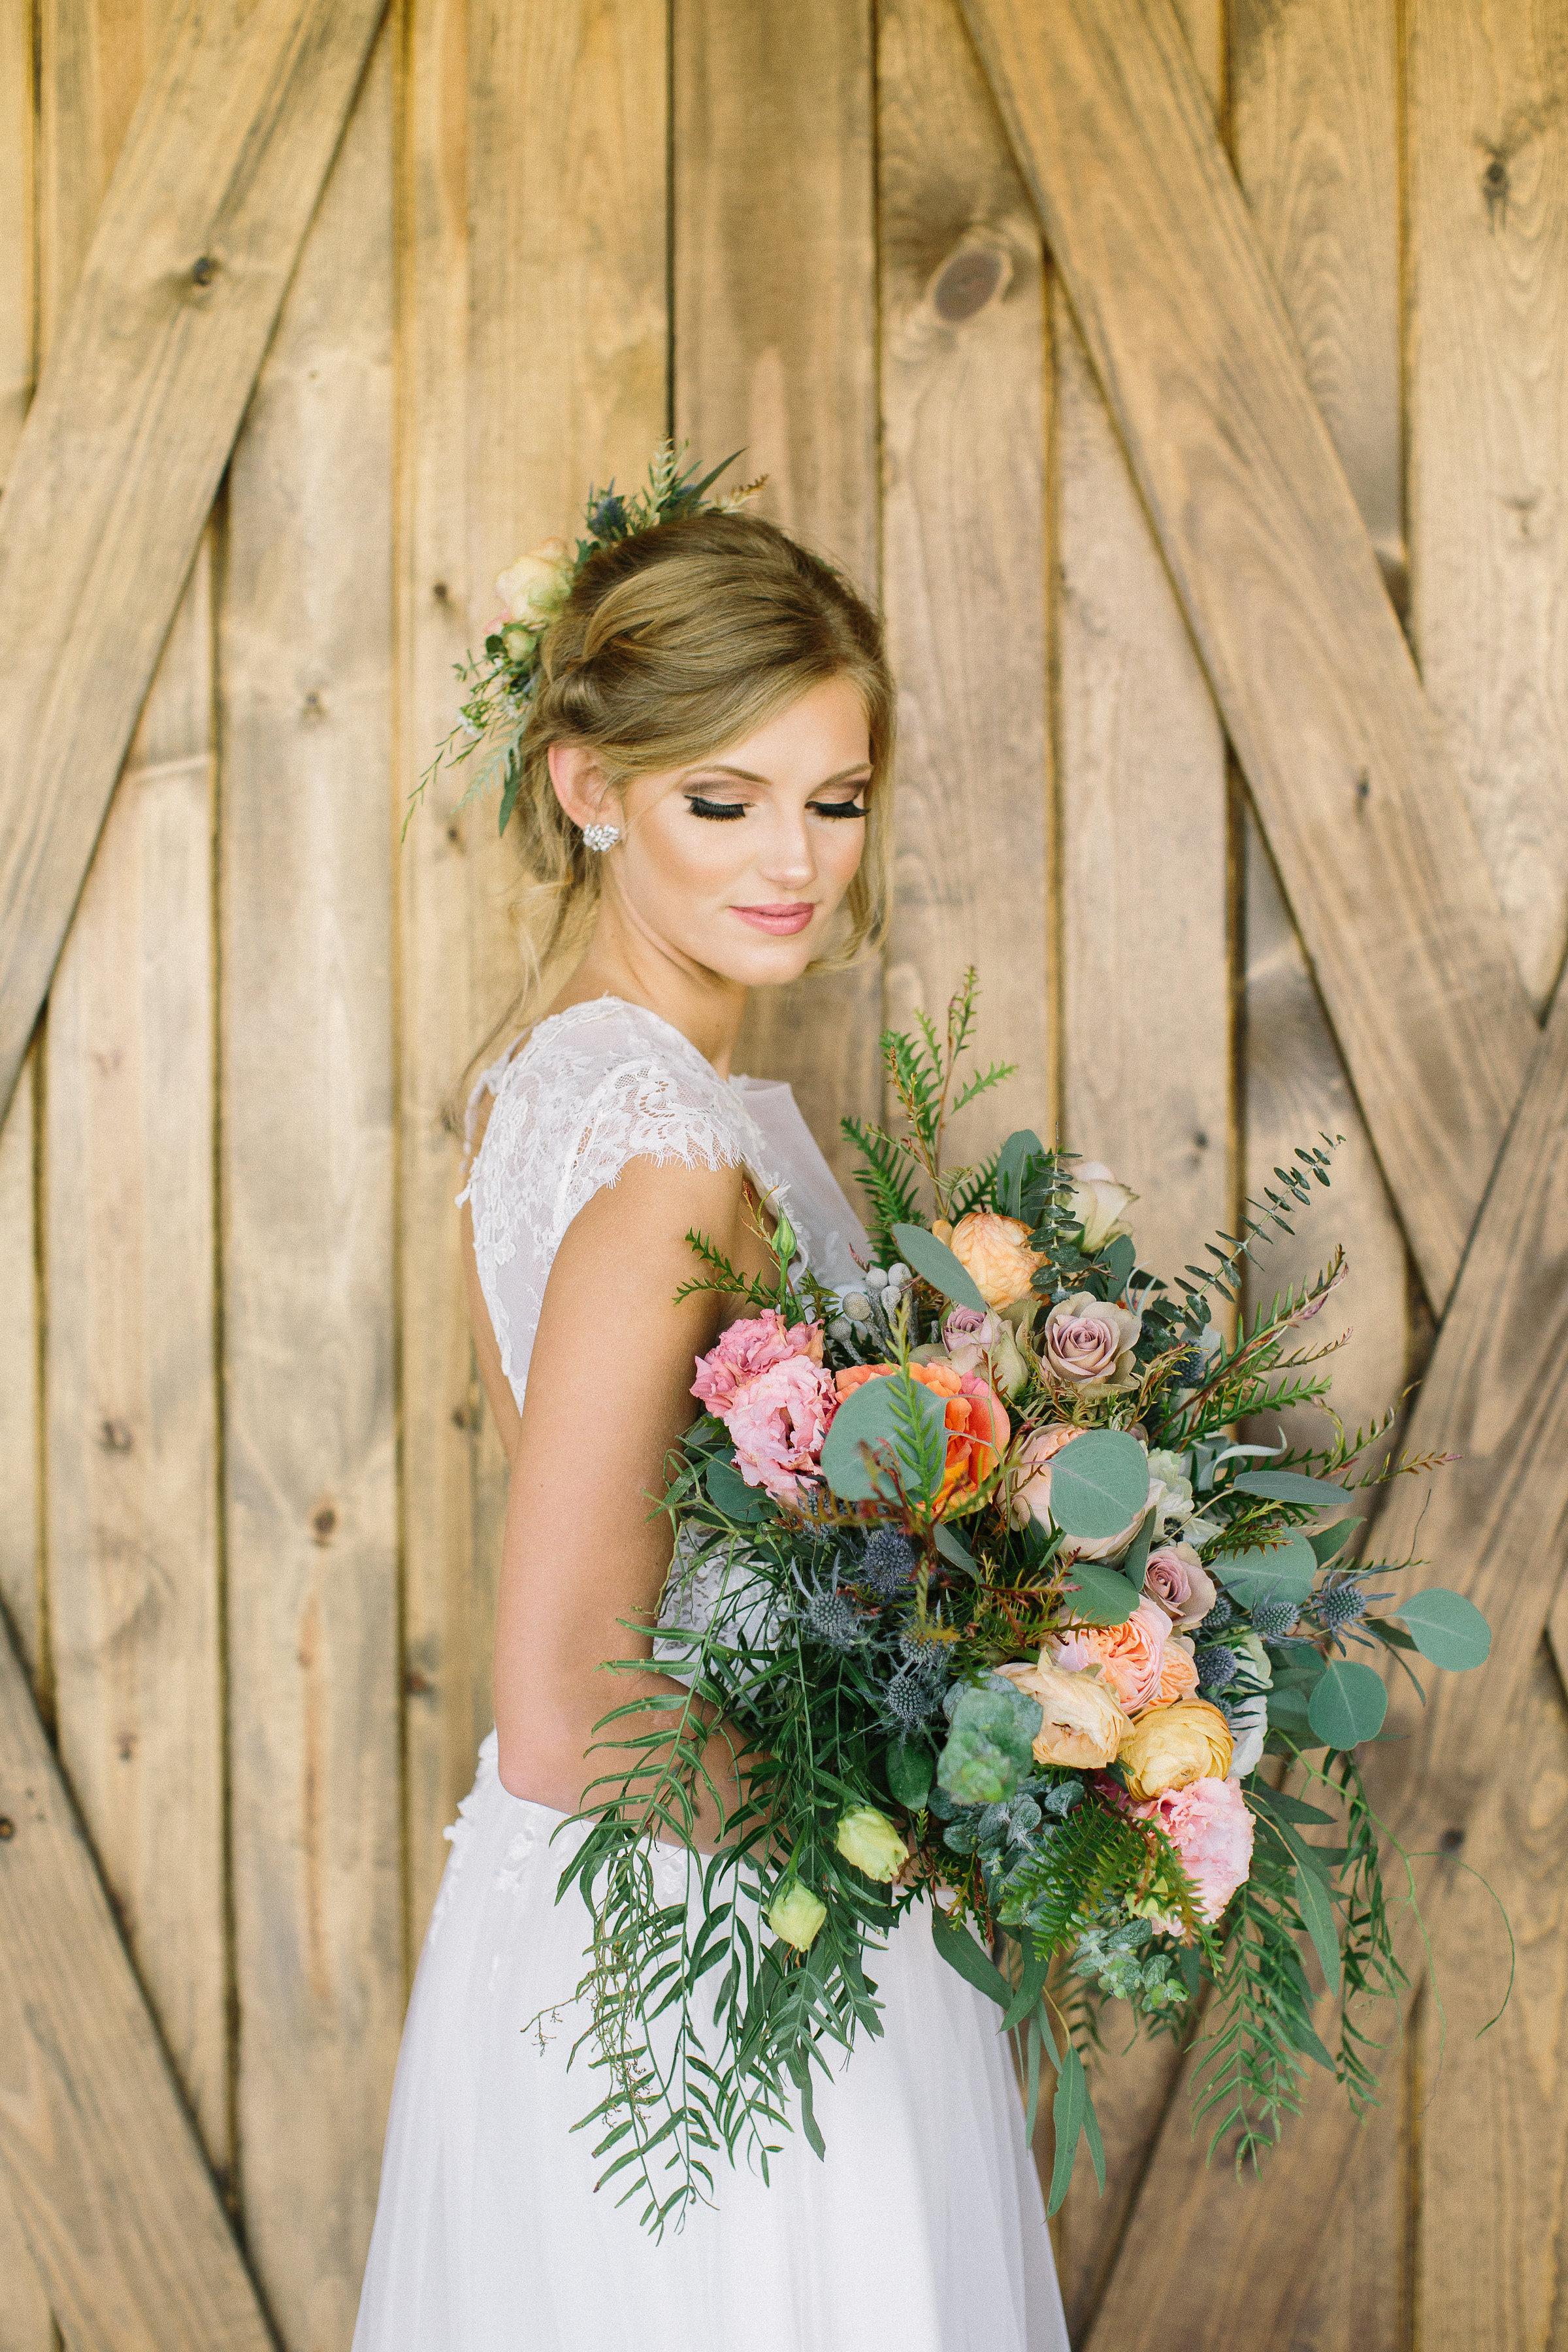 Ellen-Ashton-Photography-Peach-Creek-Ranch-Weddings-Wed-and-Prosper51